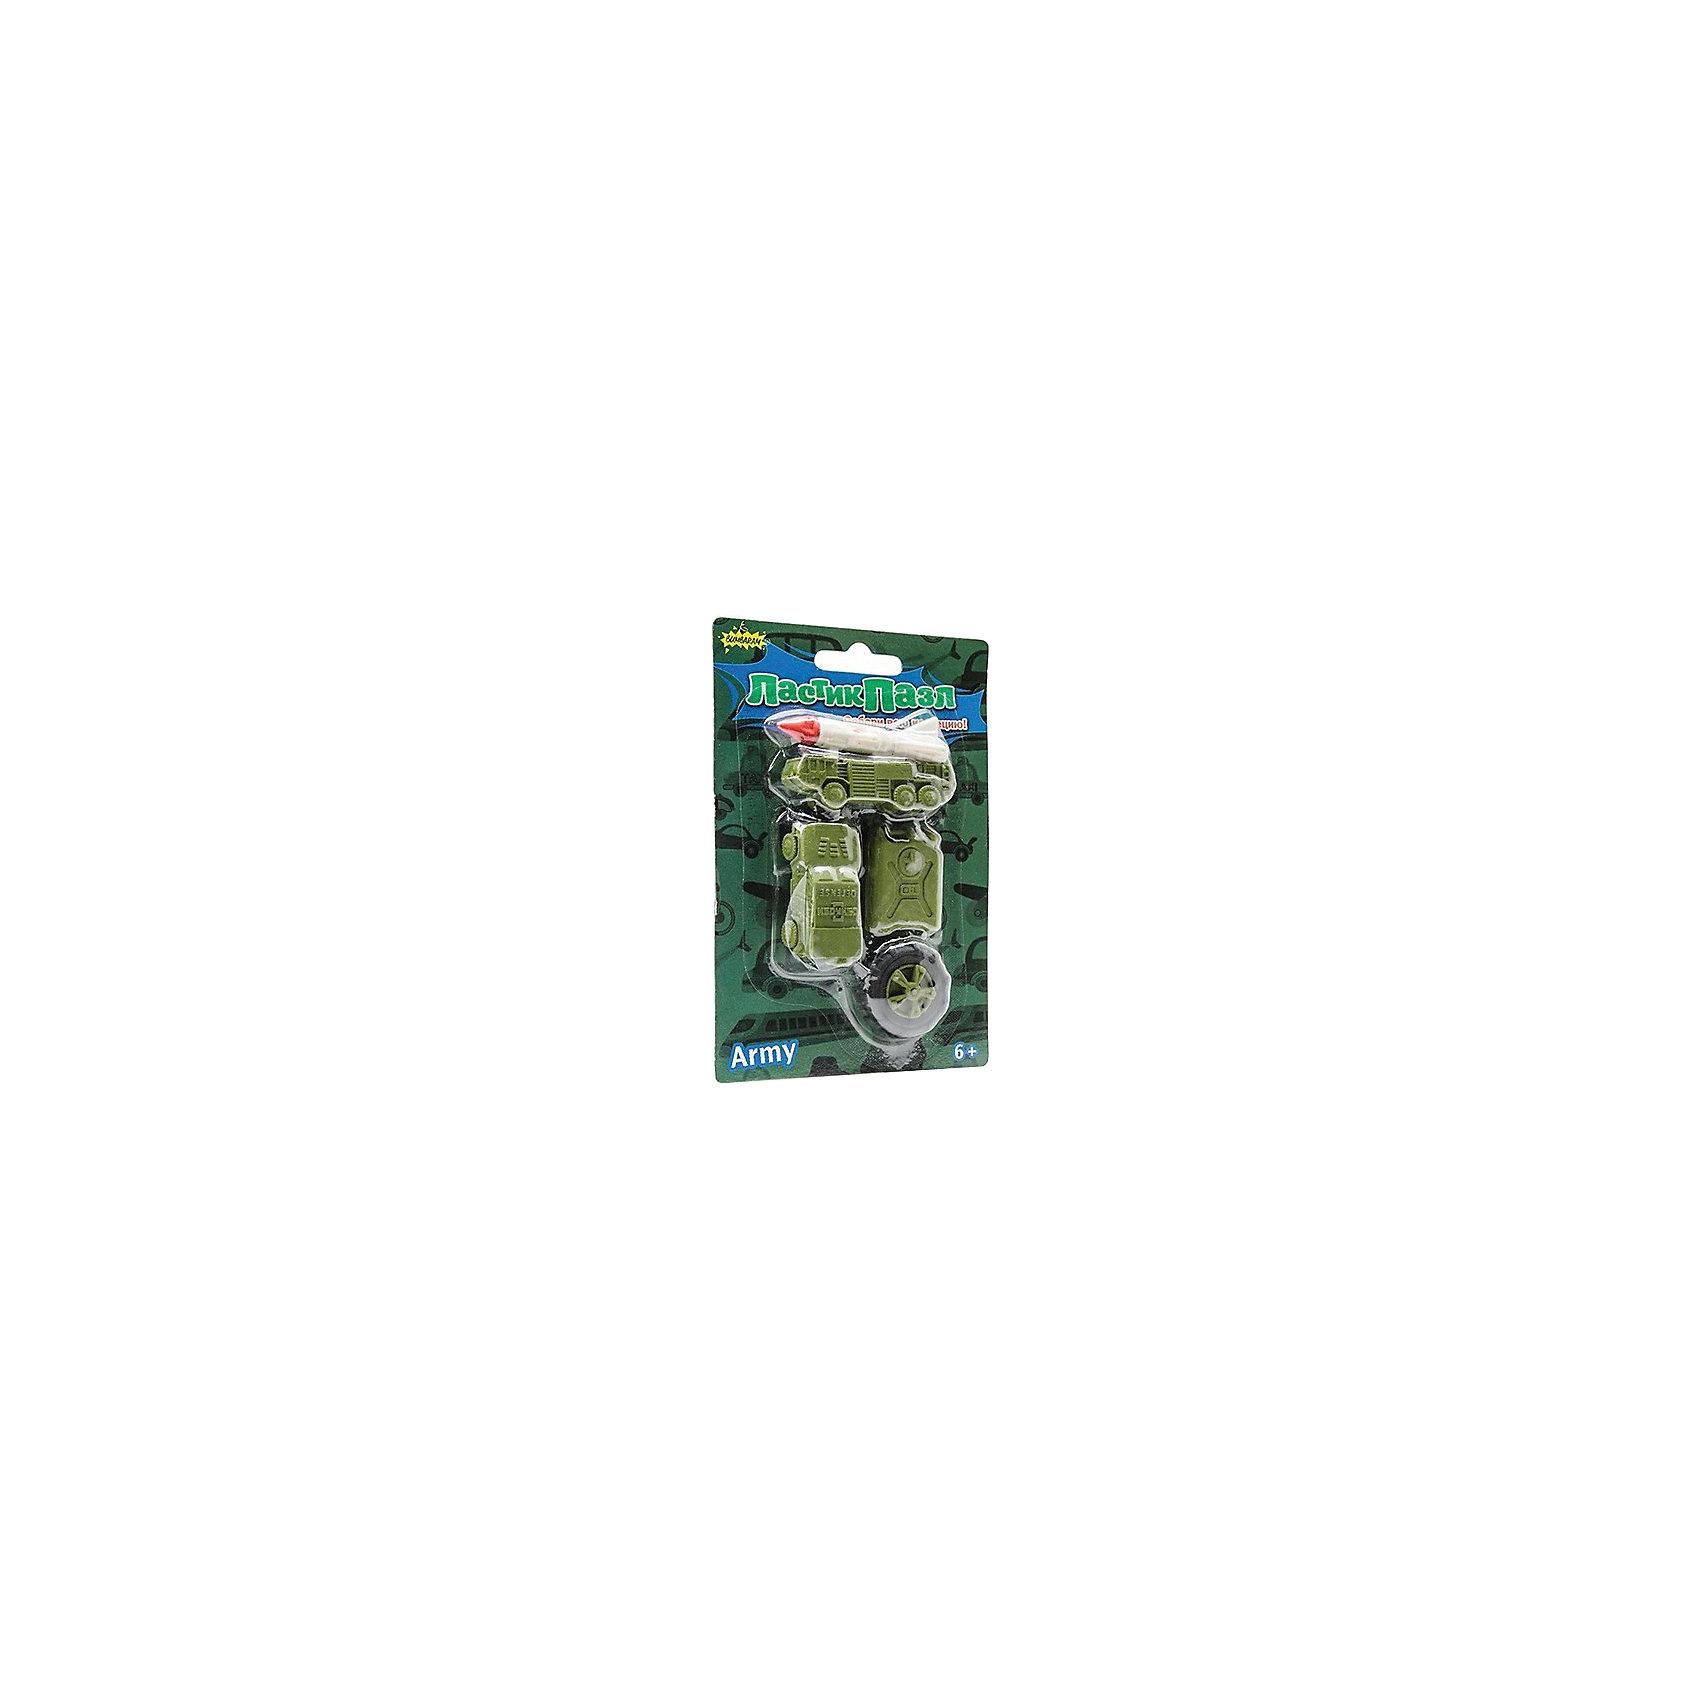 Бумбарам Набор Ластики-Пазлы - Военная техника Бумбарам бумбарам набор ластиков пазлов закуски бумбарам